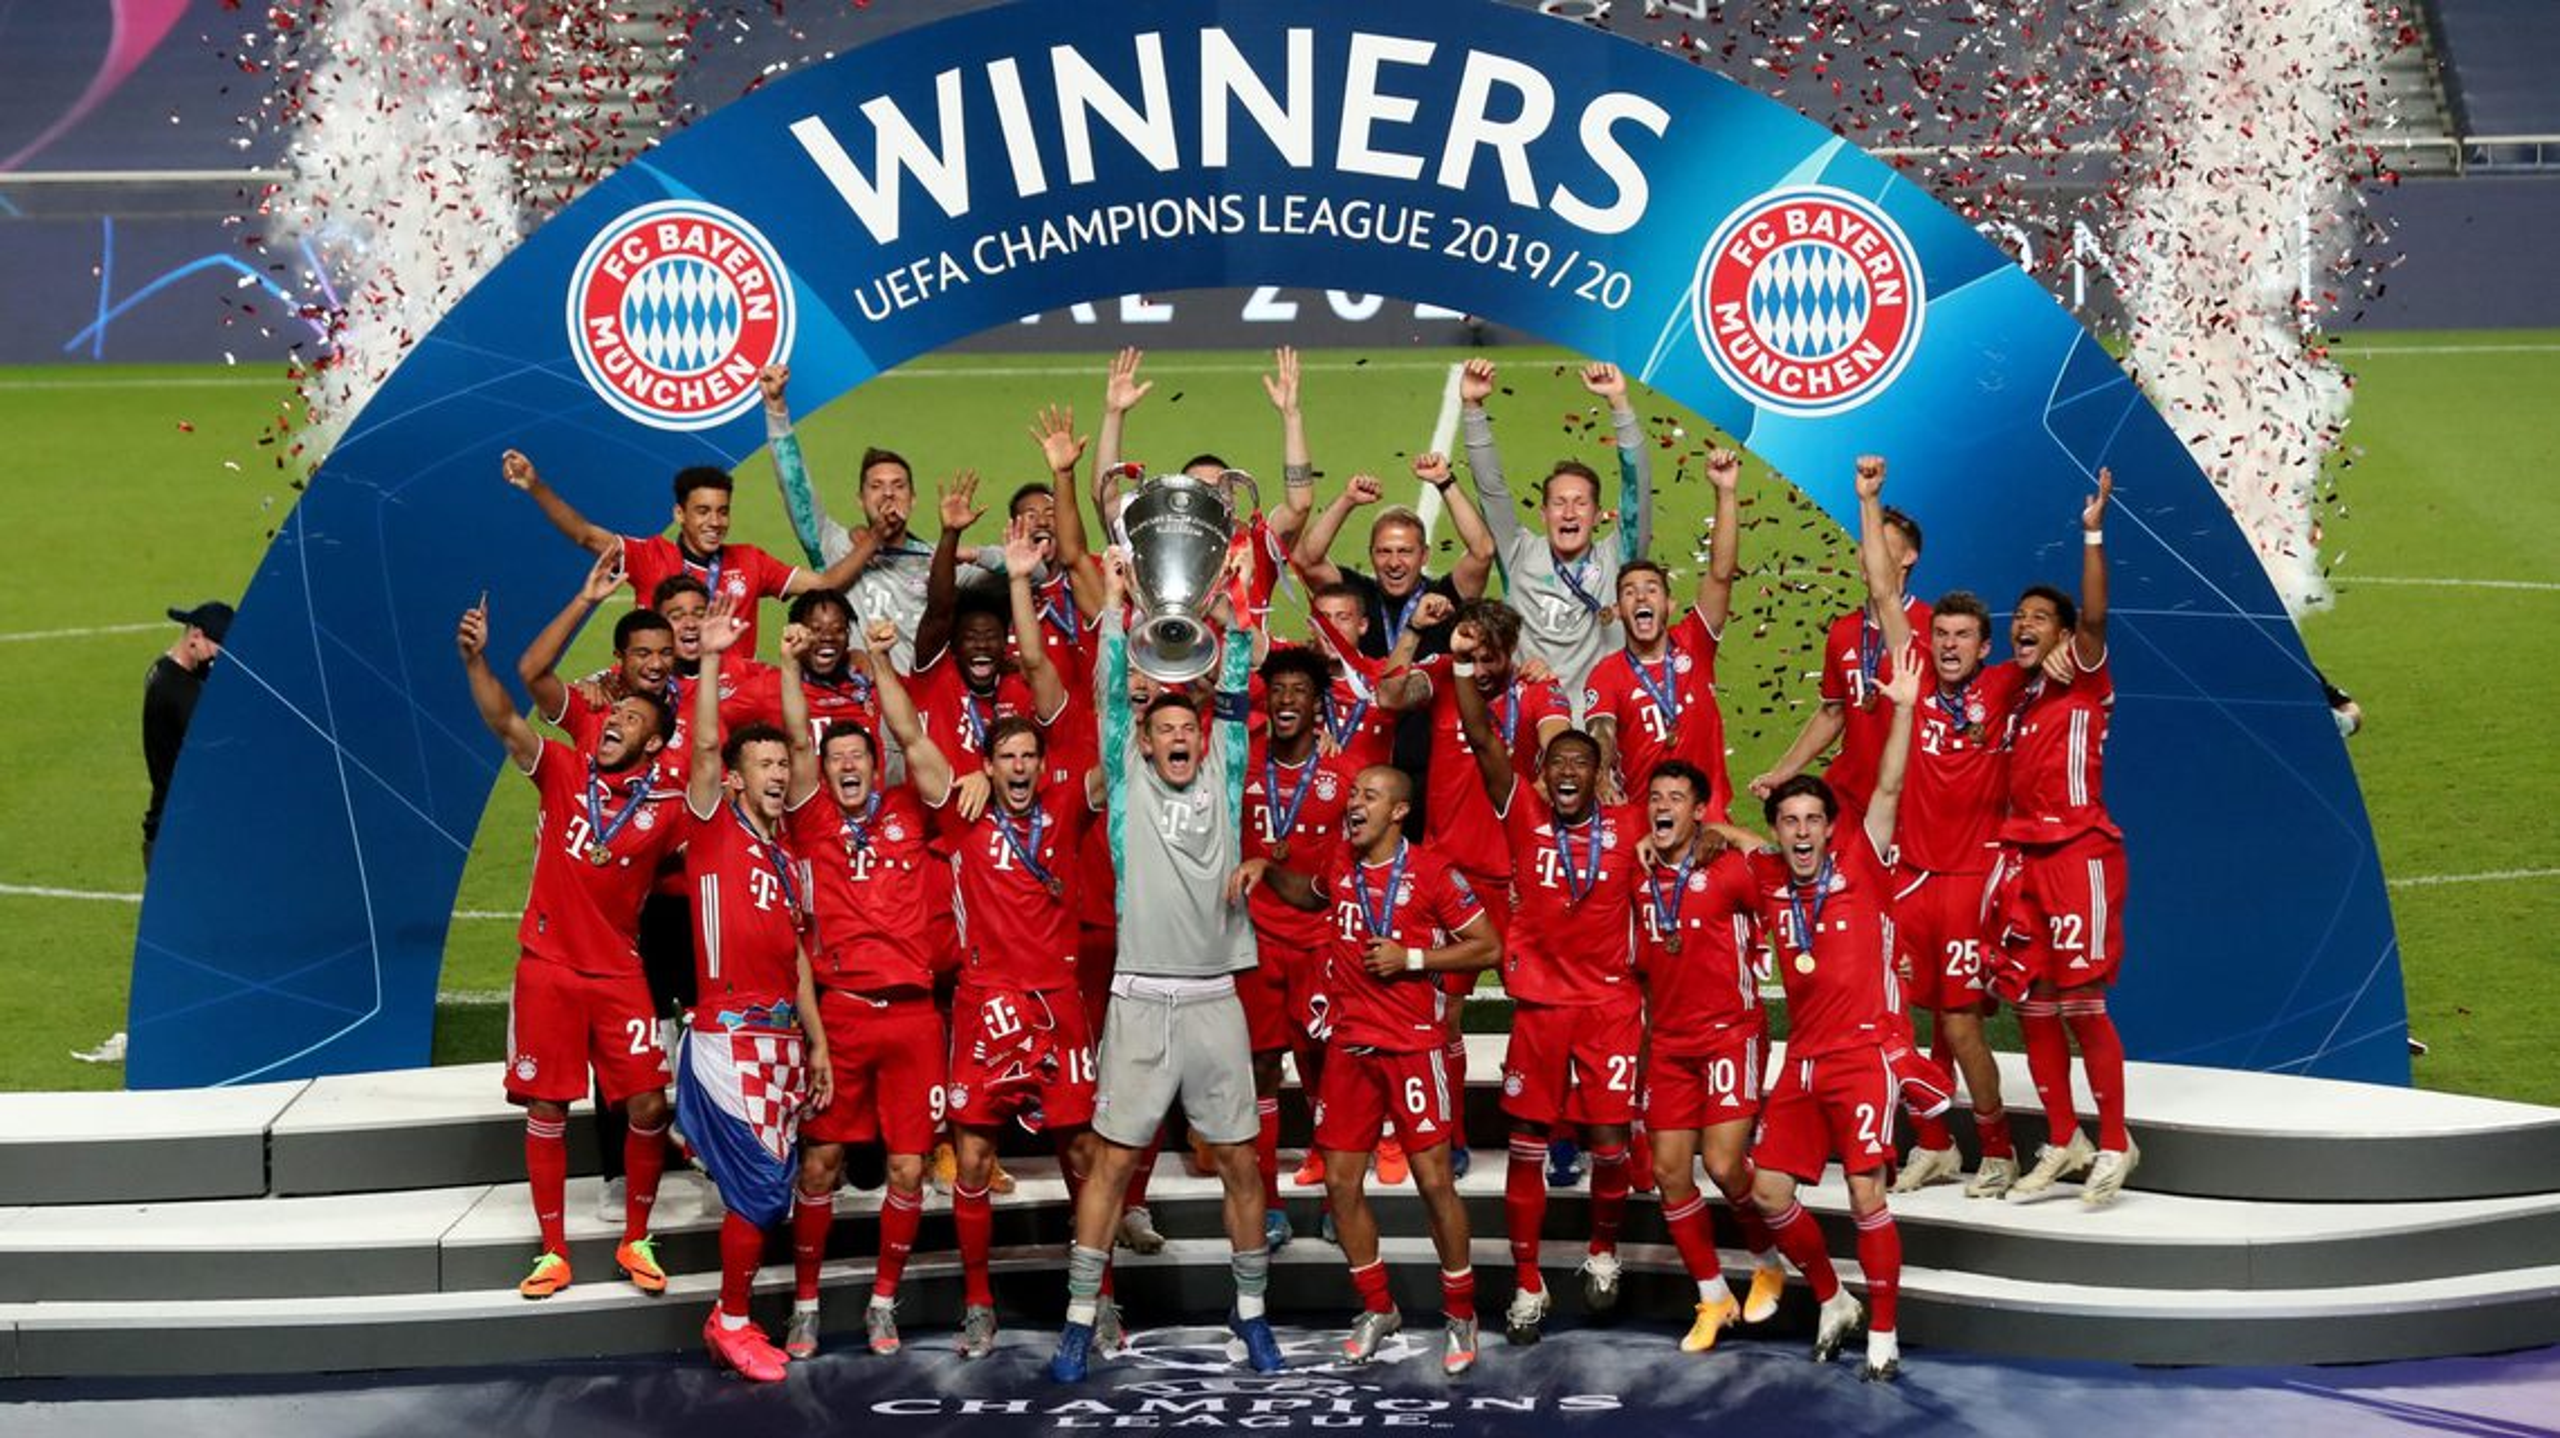 Bundesliga | Bayern Munich seal treble with UEFA Champions League ...